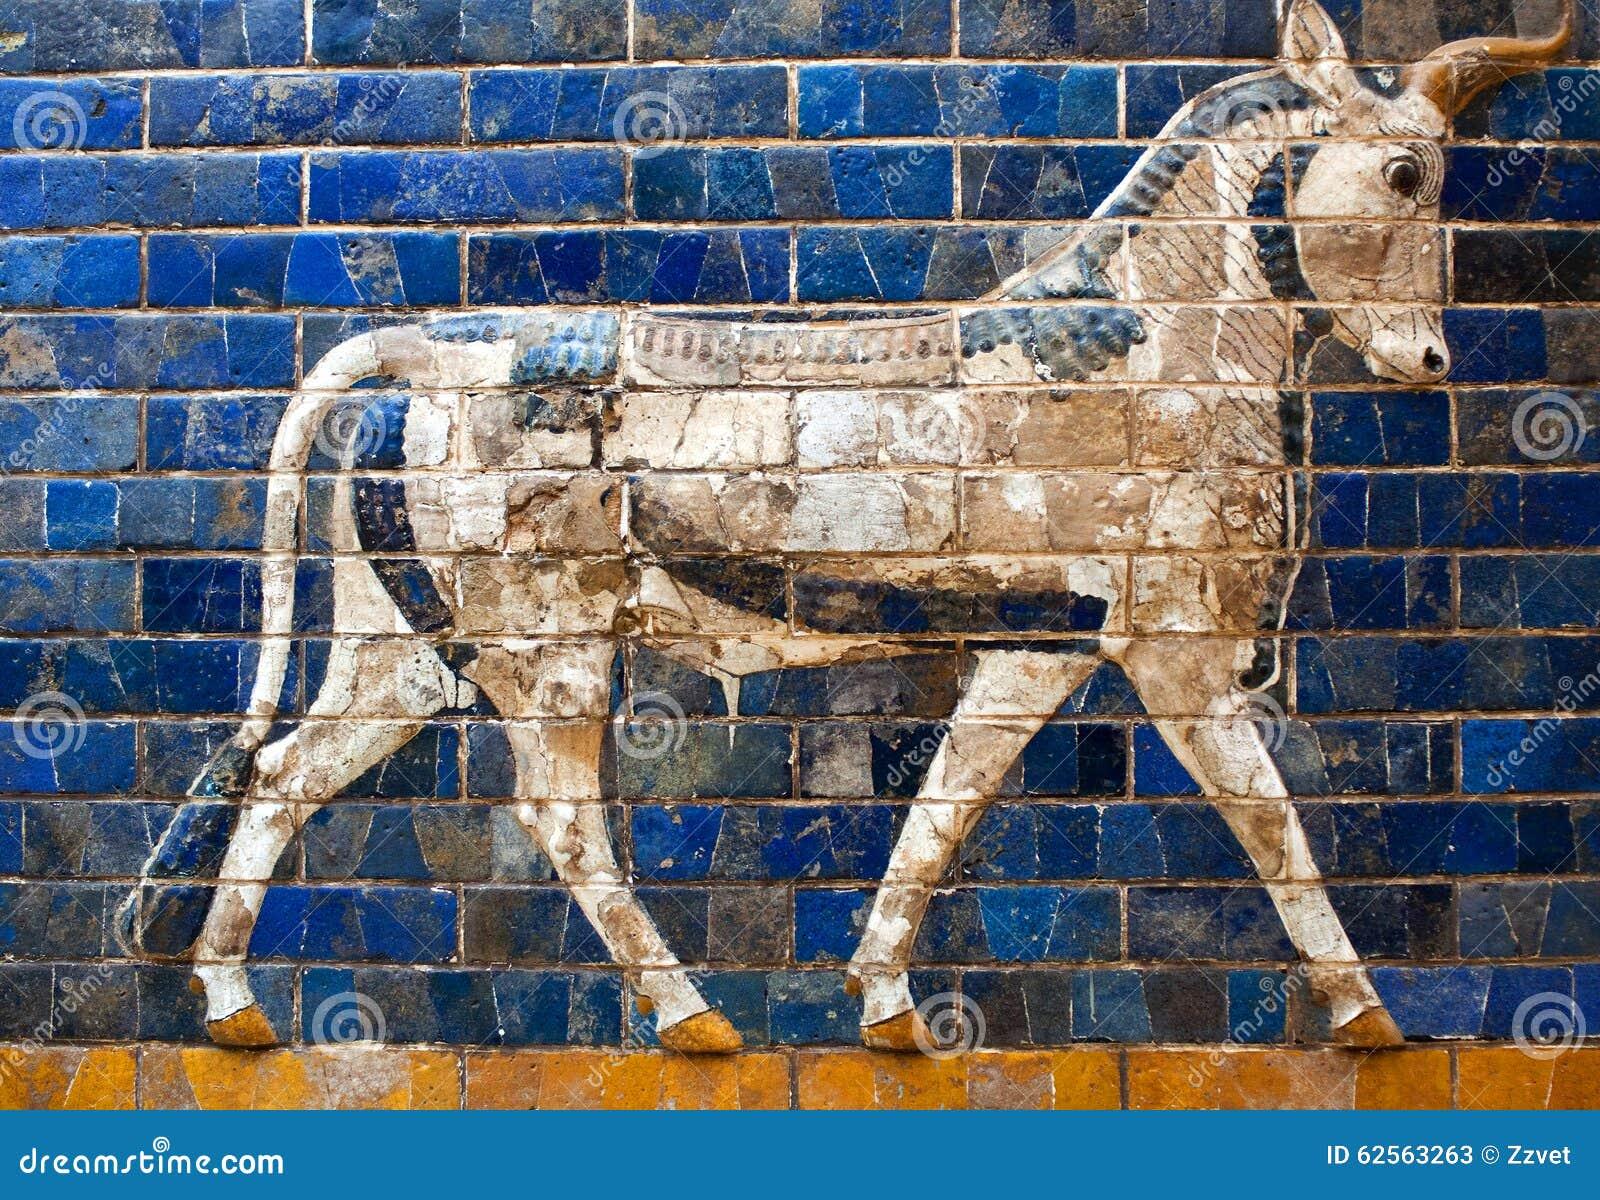 Details of the Babylonian Ischtar Tor